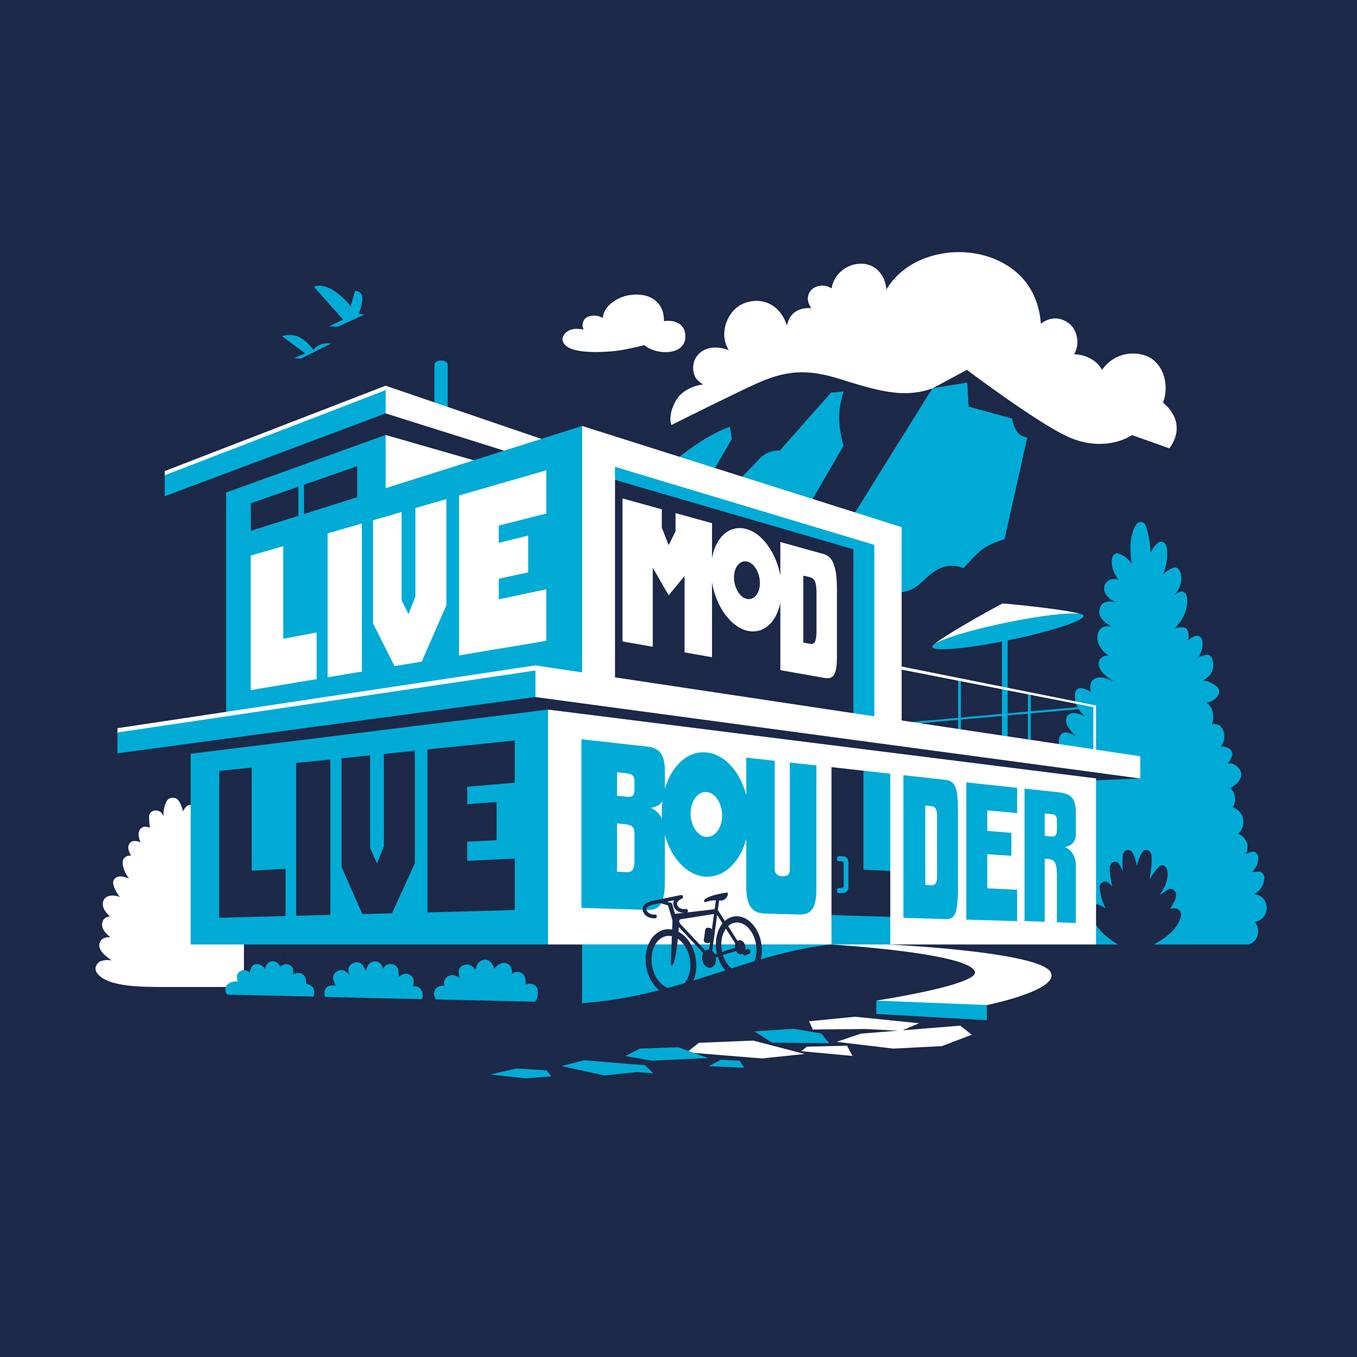 Live Mod, Live Boulder  • A t-shirt design about living modern.  Client: Mod Boulder